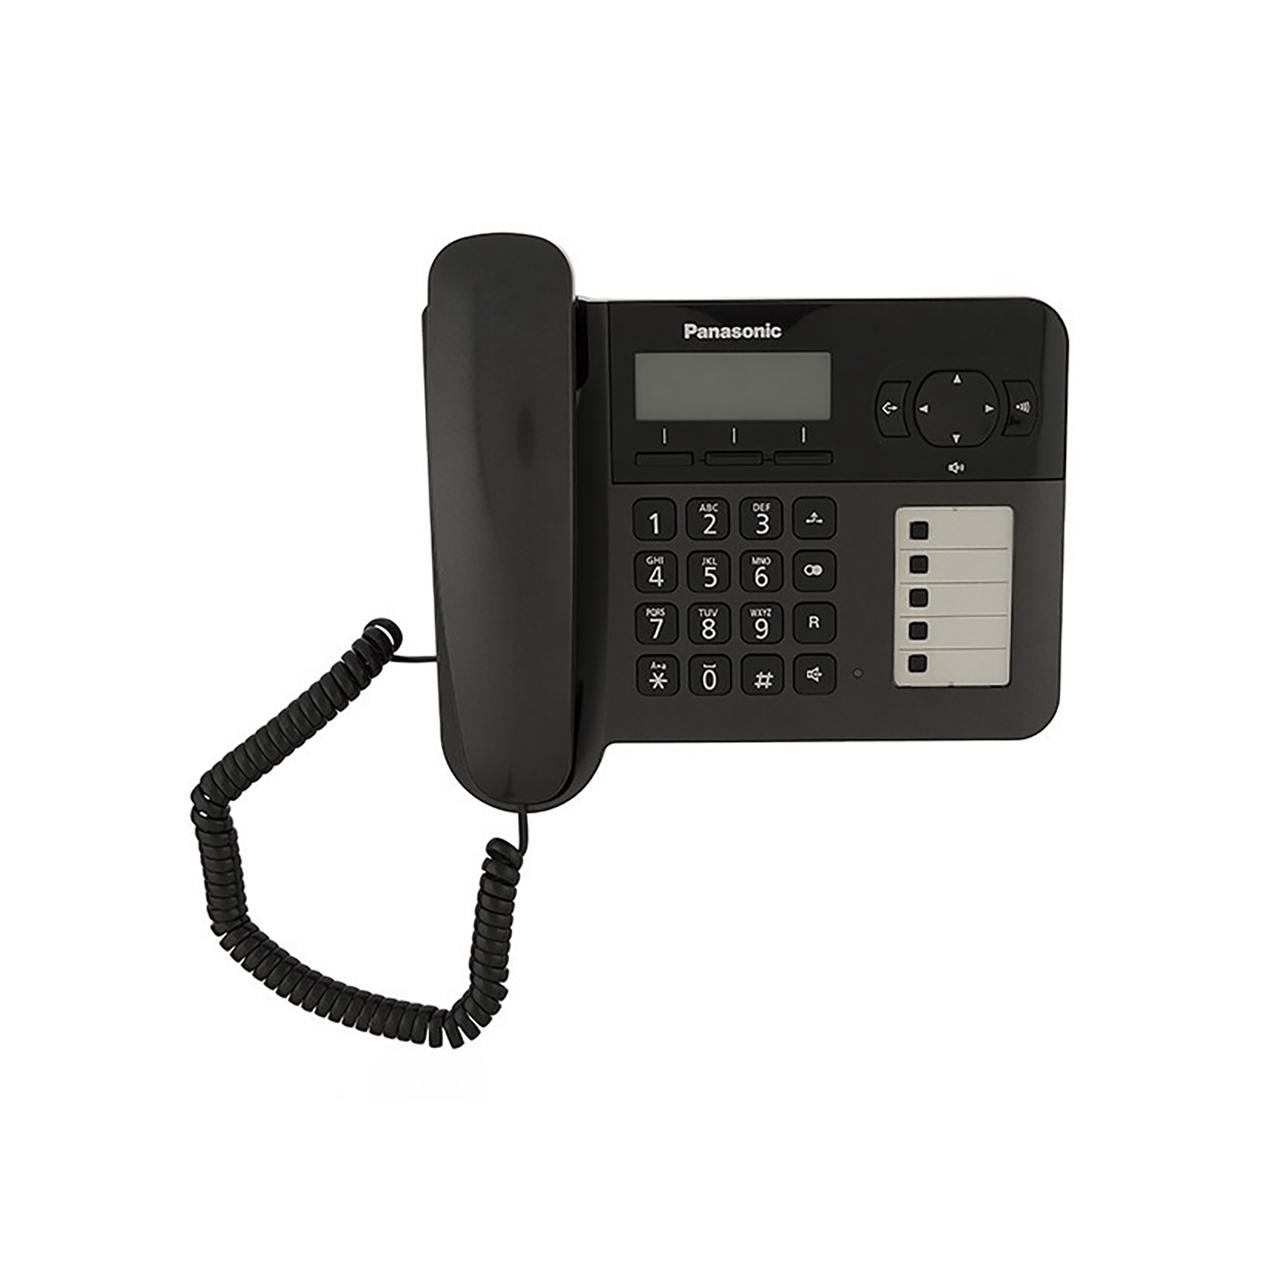 گوشی تلفن بیسیم پاناسونیک مدل Panasonic-KX-TG6458BX | باسیم